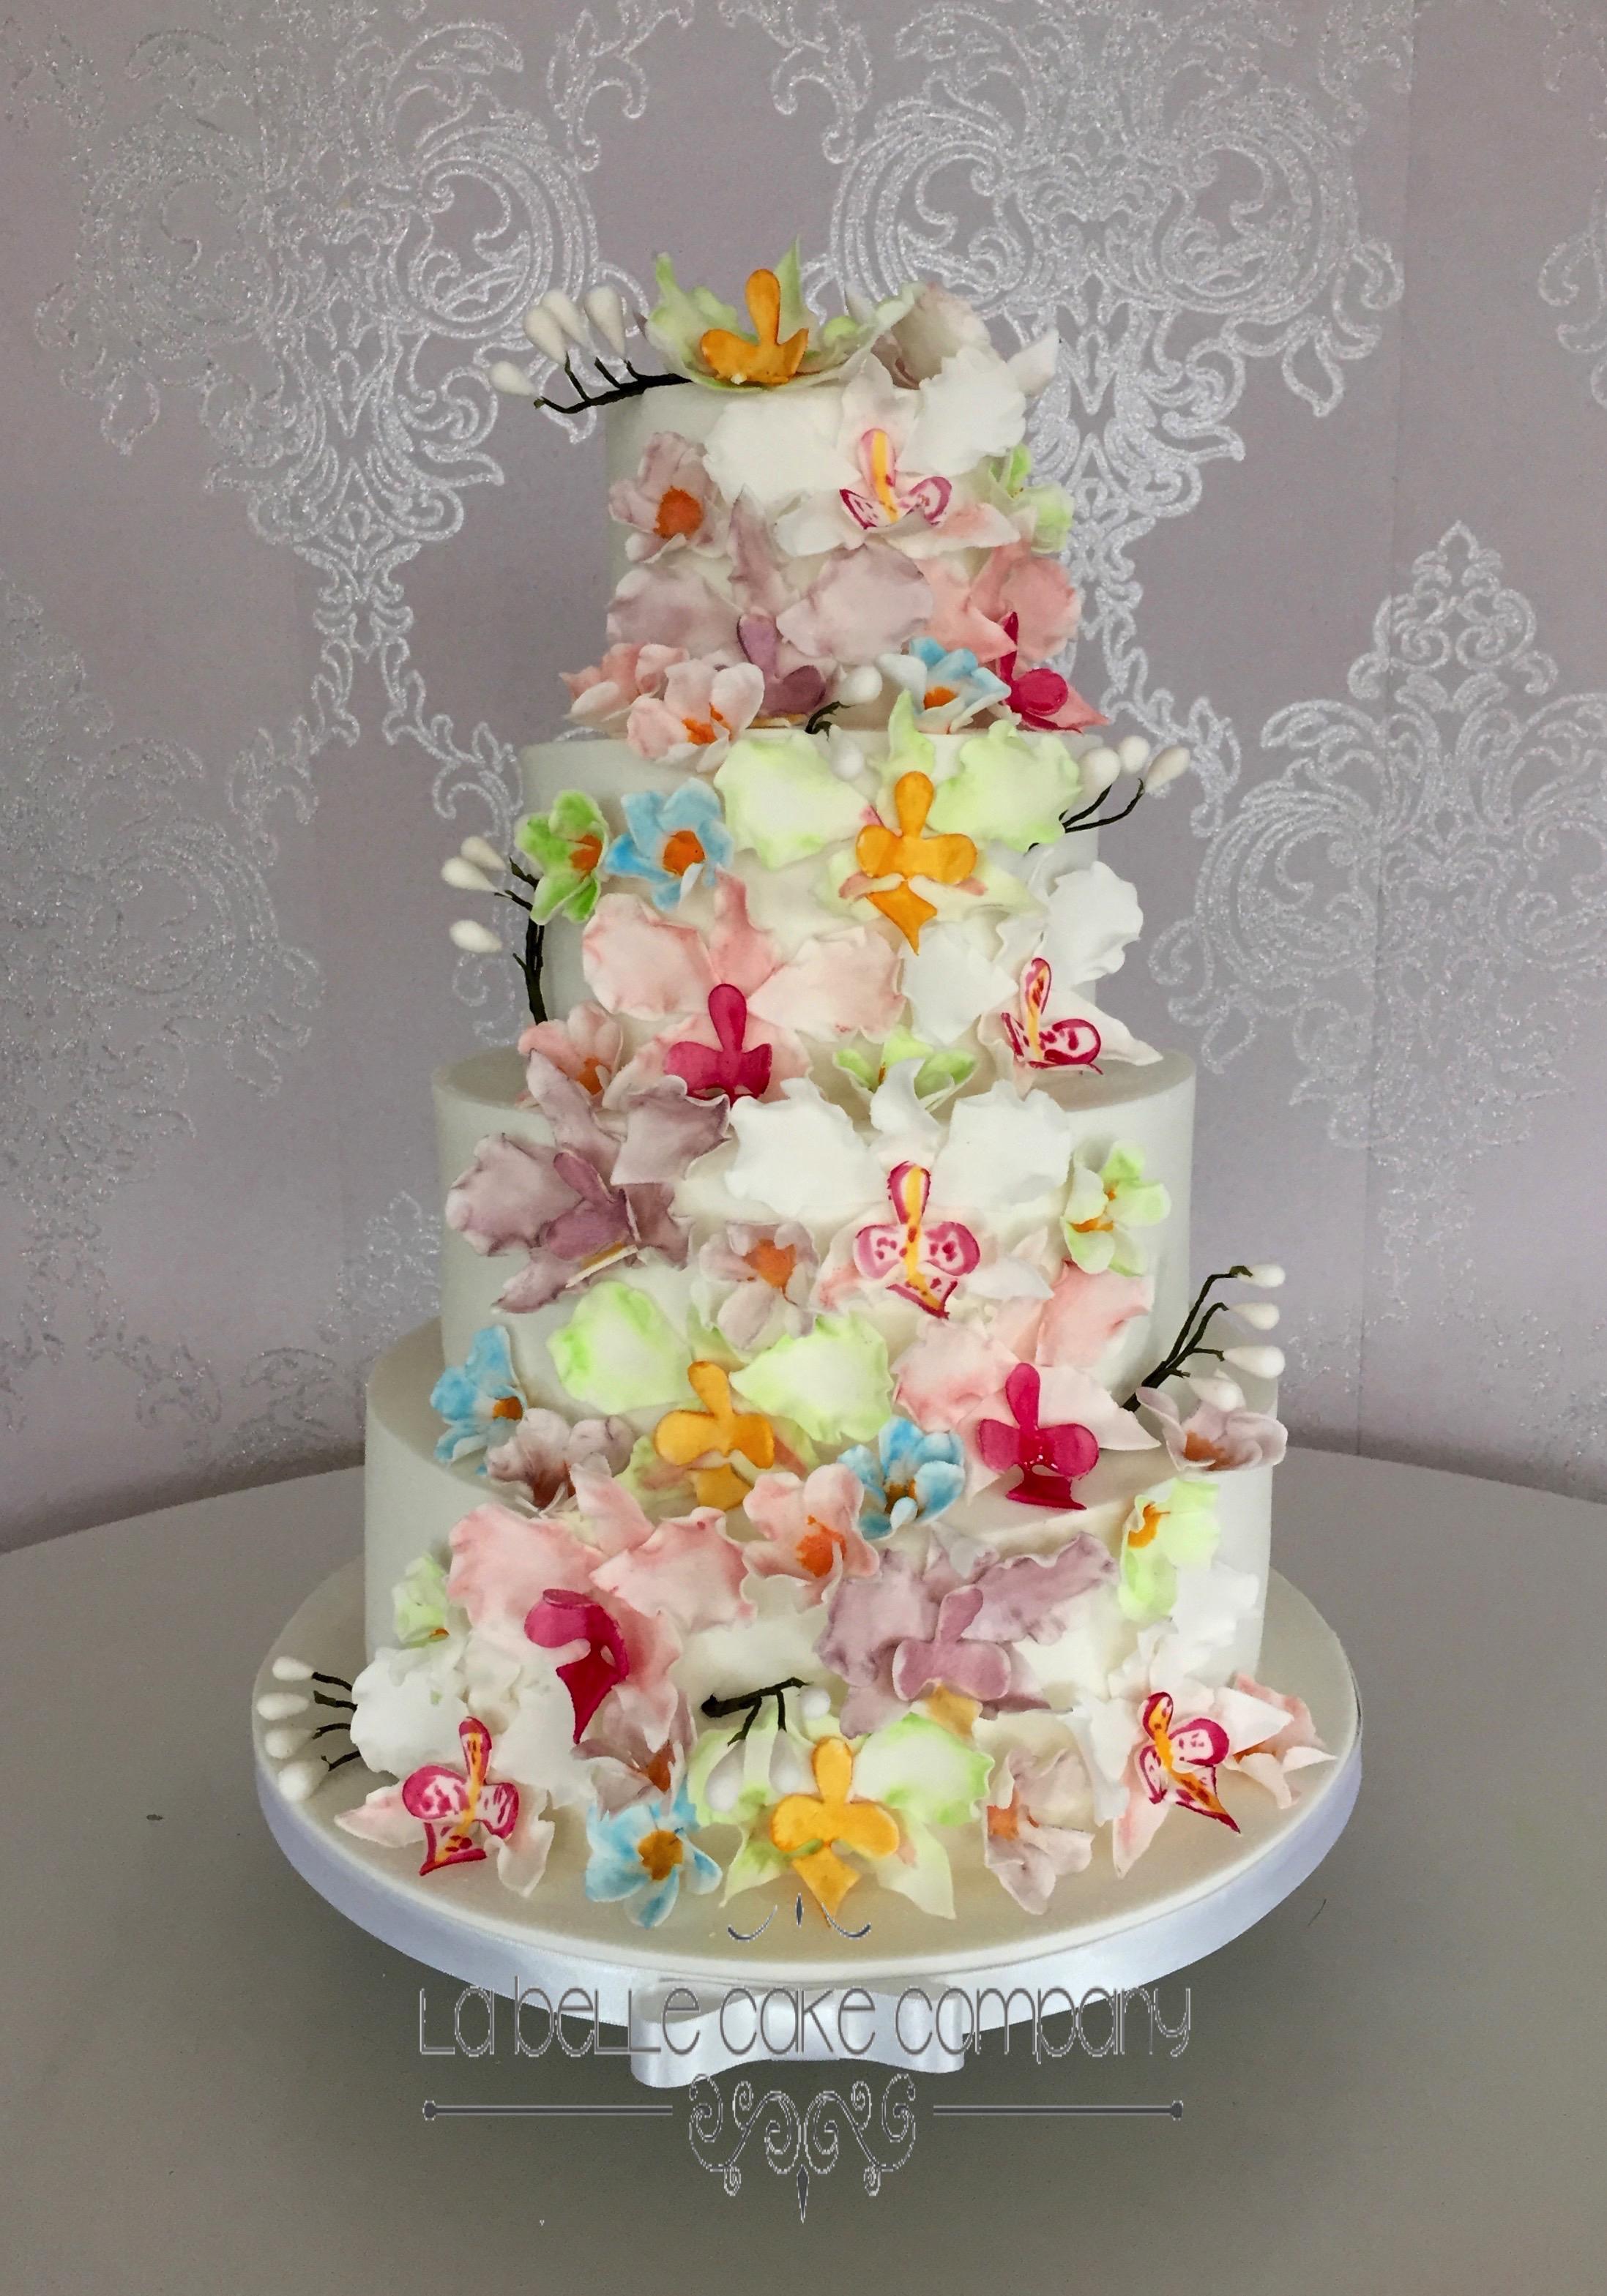 Wedding Cake Ideas.Summer Wedding Cake Ideas From La Belle Cake Co